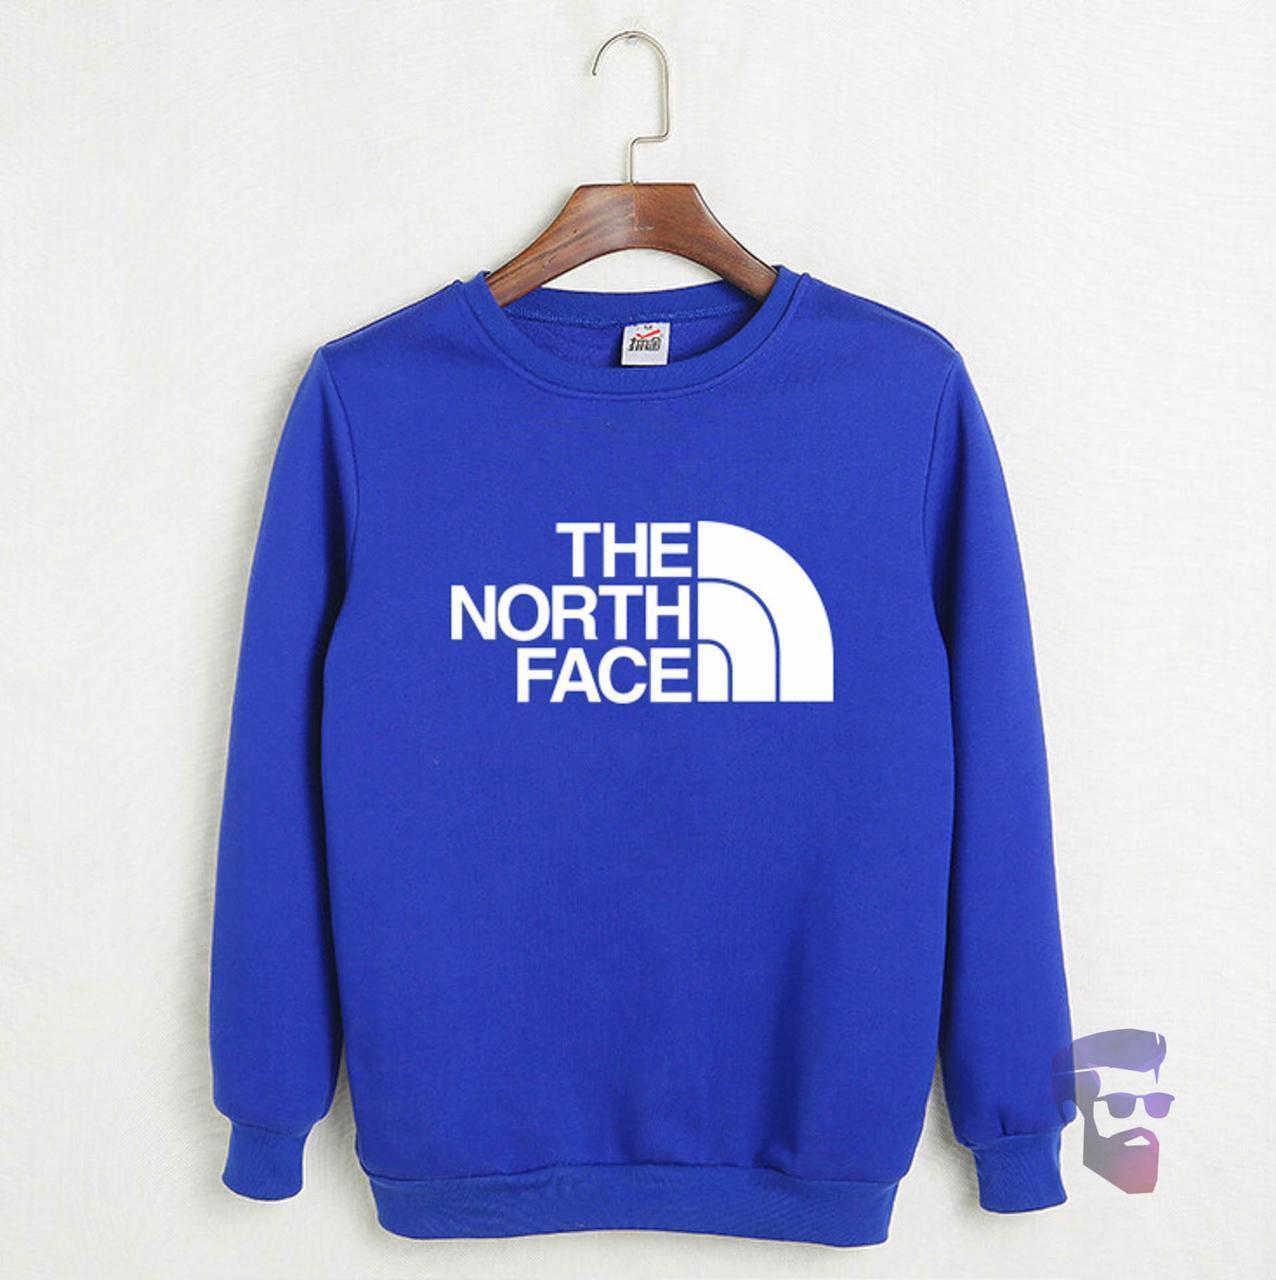 Спортивная кофта Норд Фейс, Мужская кофта The North Face электрик, светло-синяя, трикотажная, реглан, свитшот